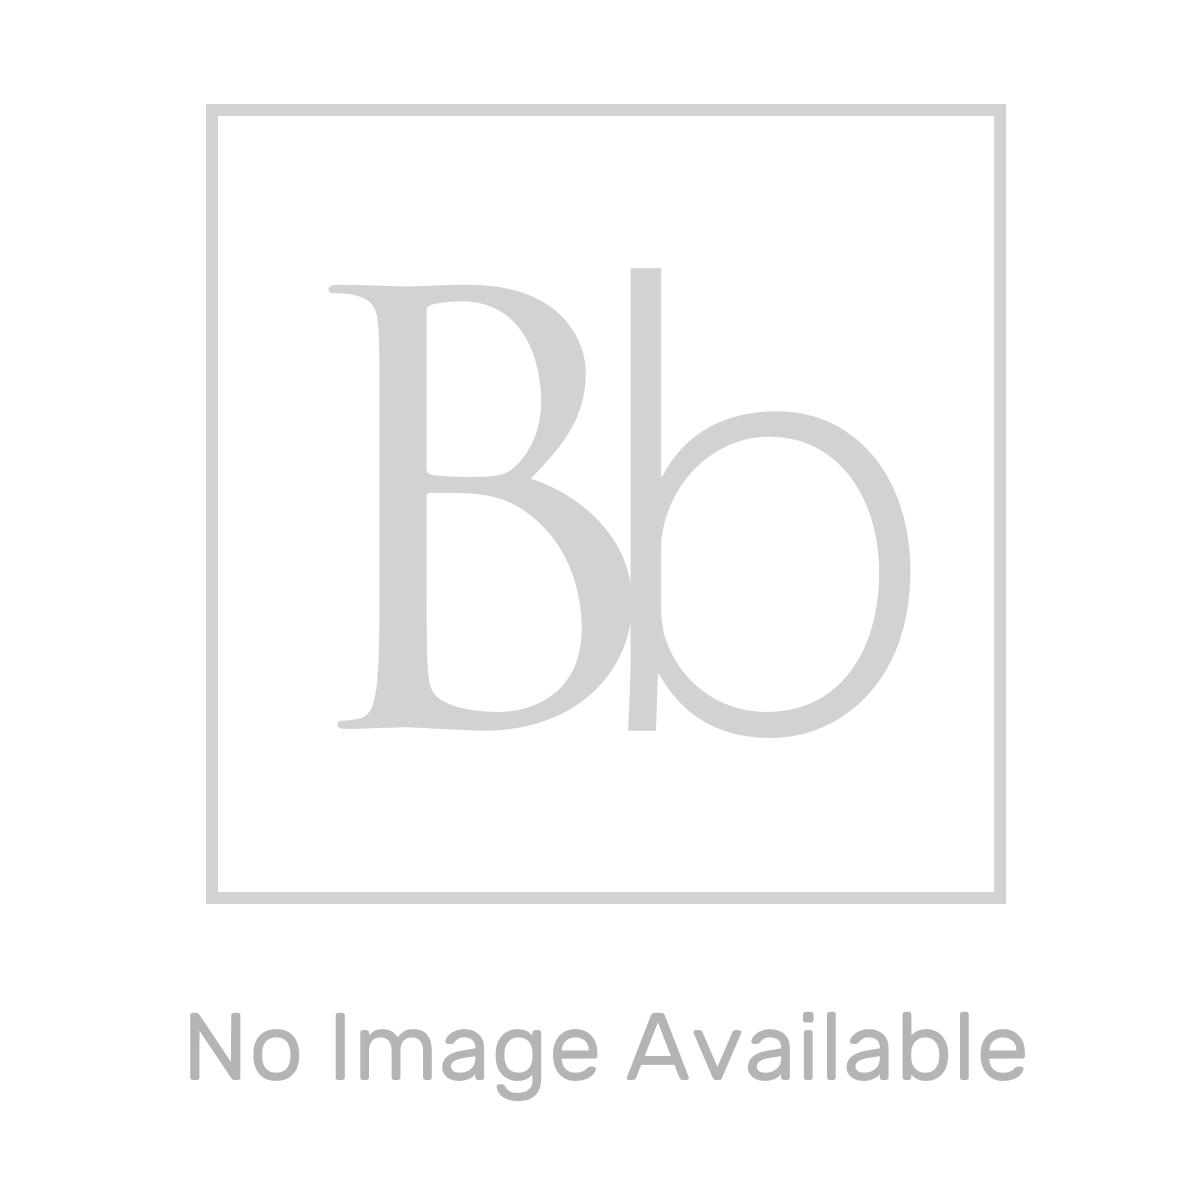 Aquadart Black Slate Shower Tray 1000 x 800 Lifestyle